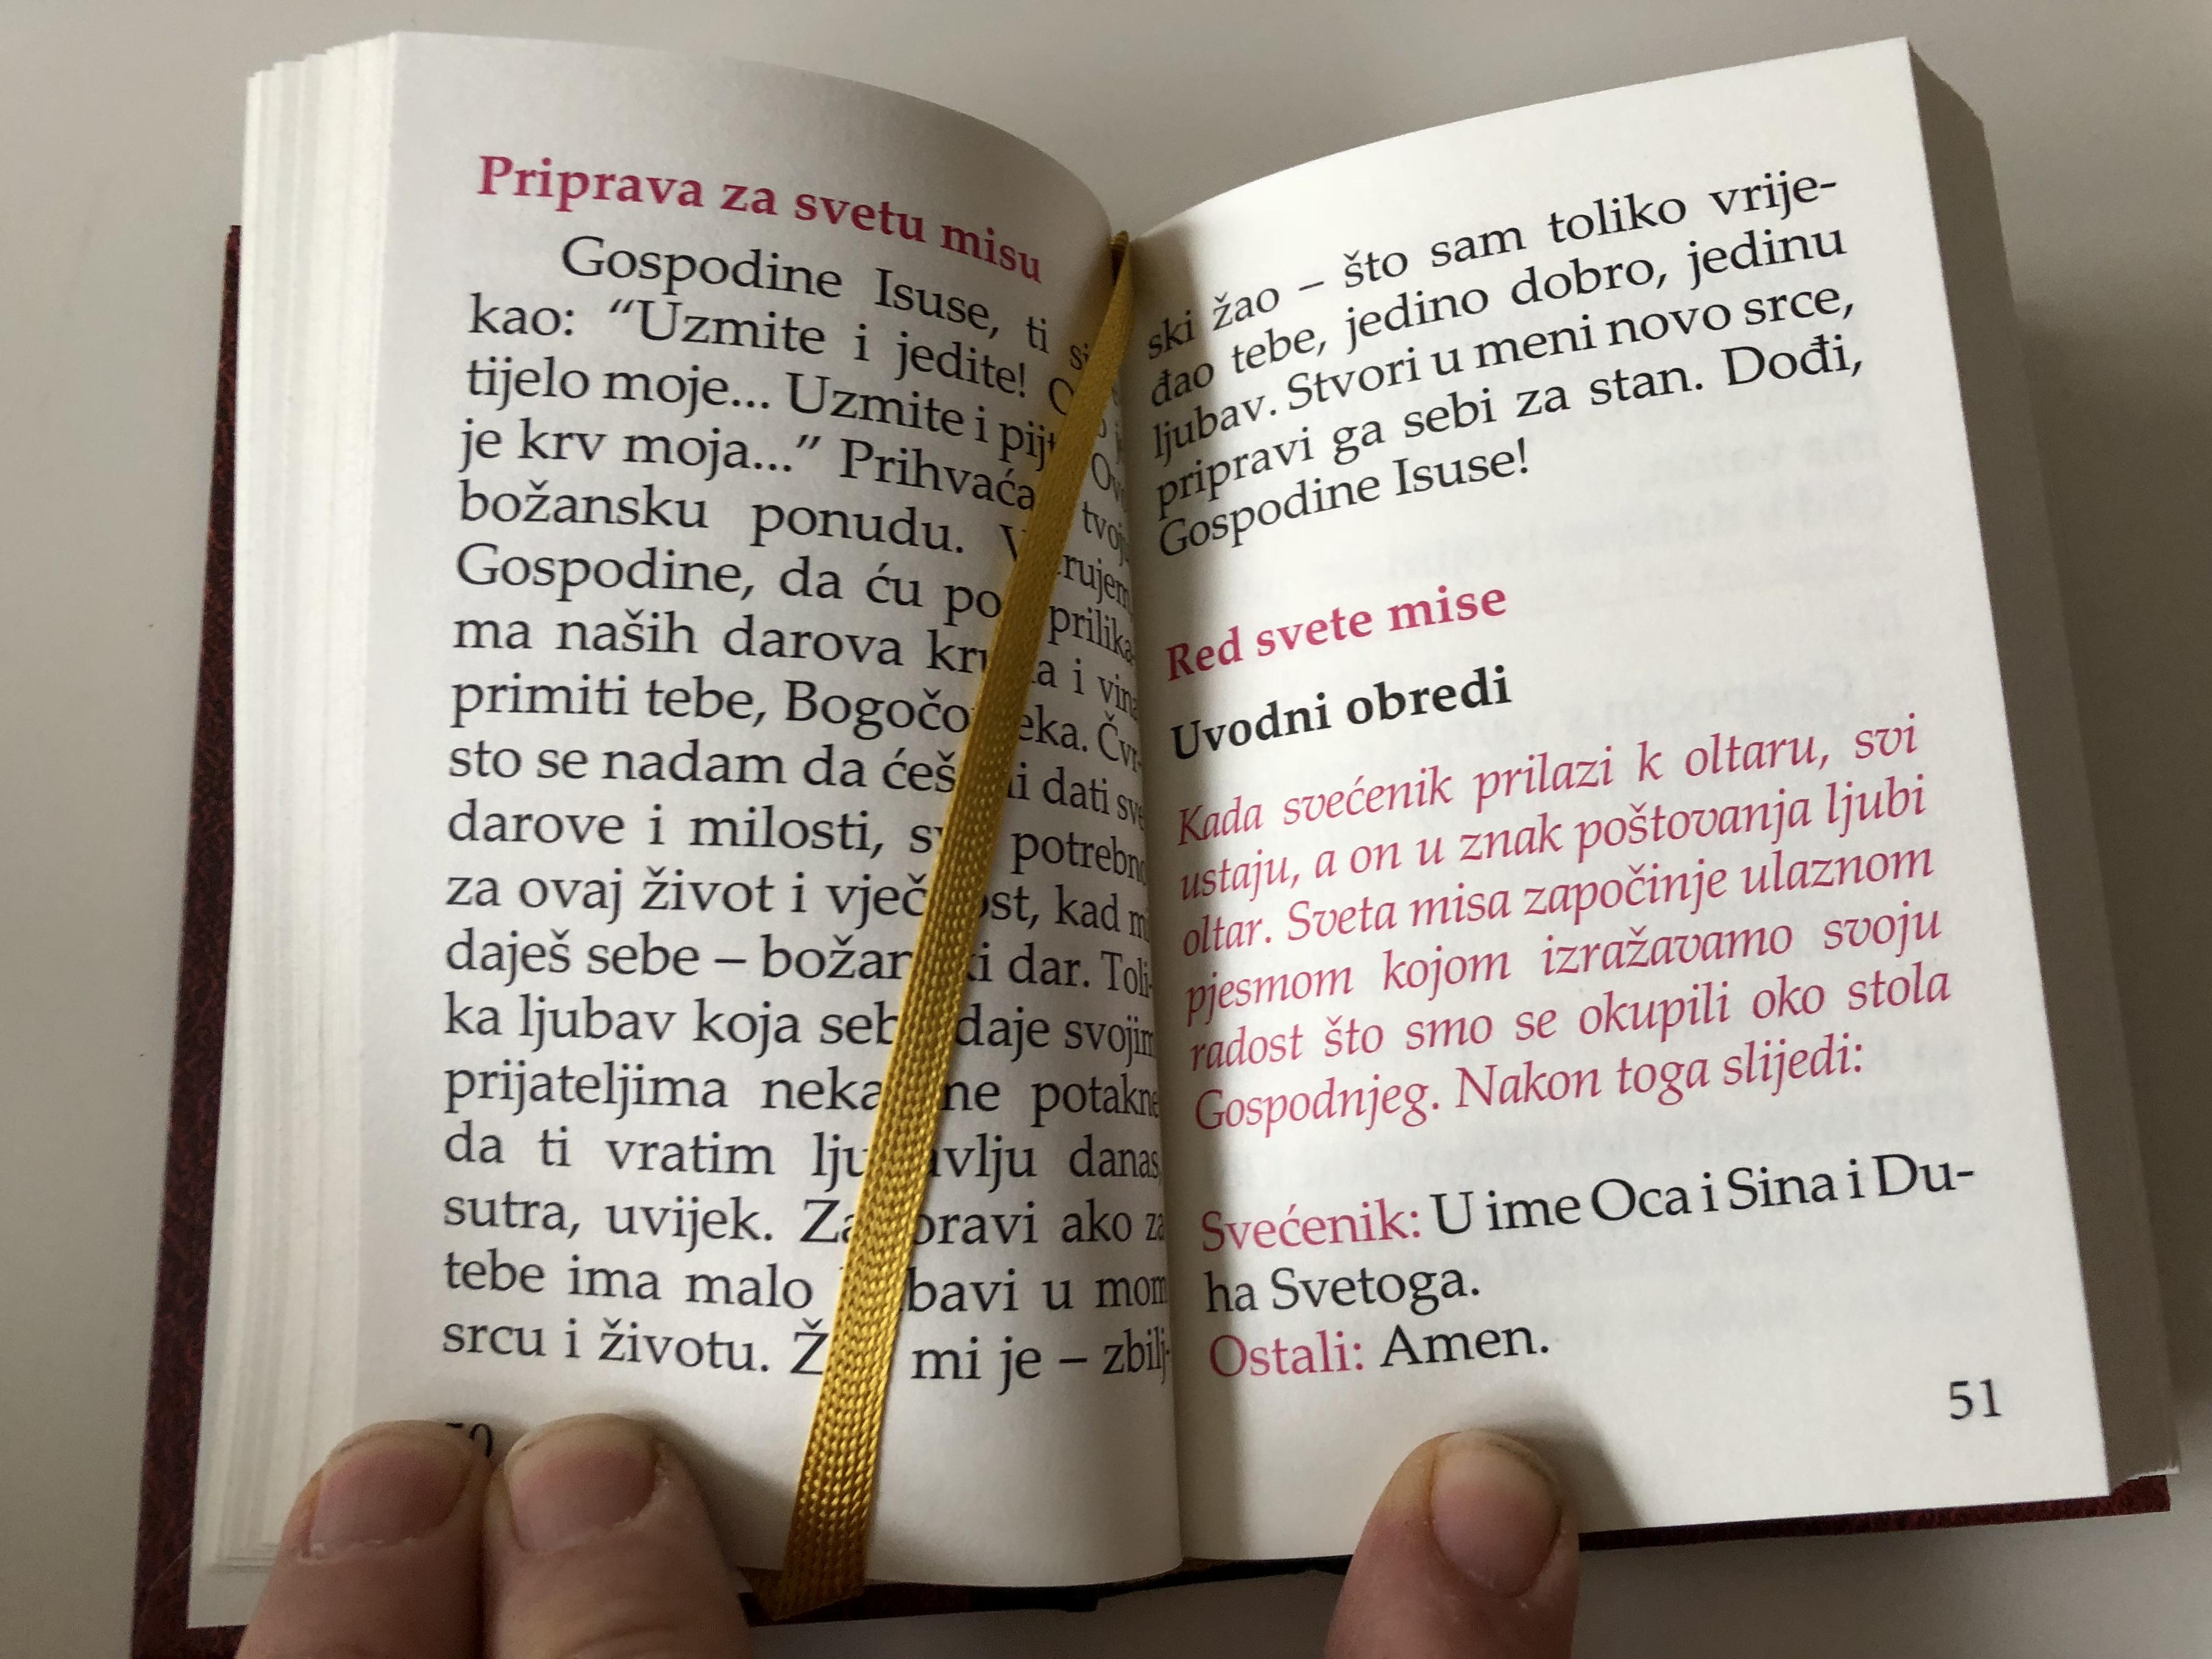 croatian-small-catholic-prayer-book-11th-edition-5-.jpg